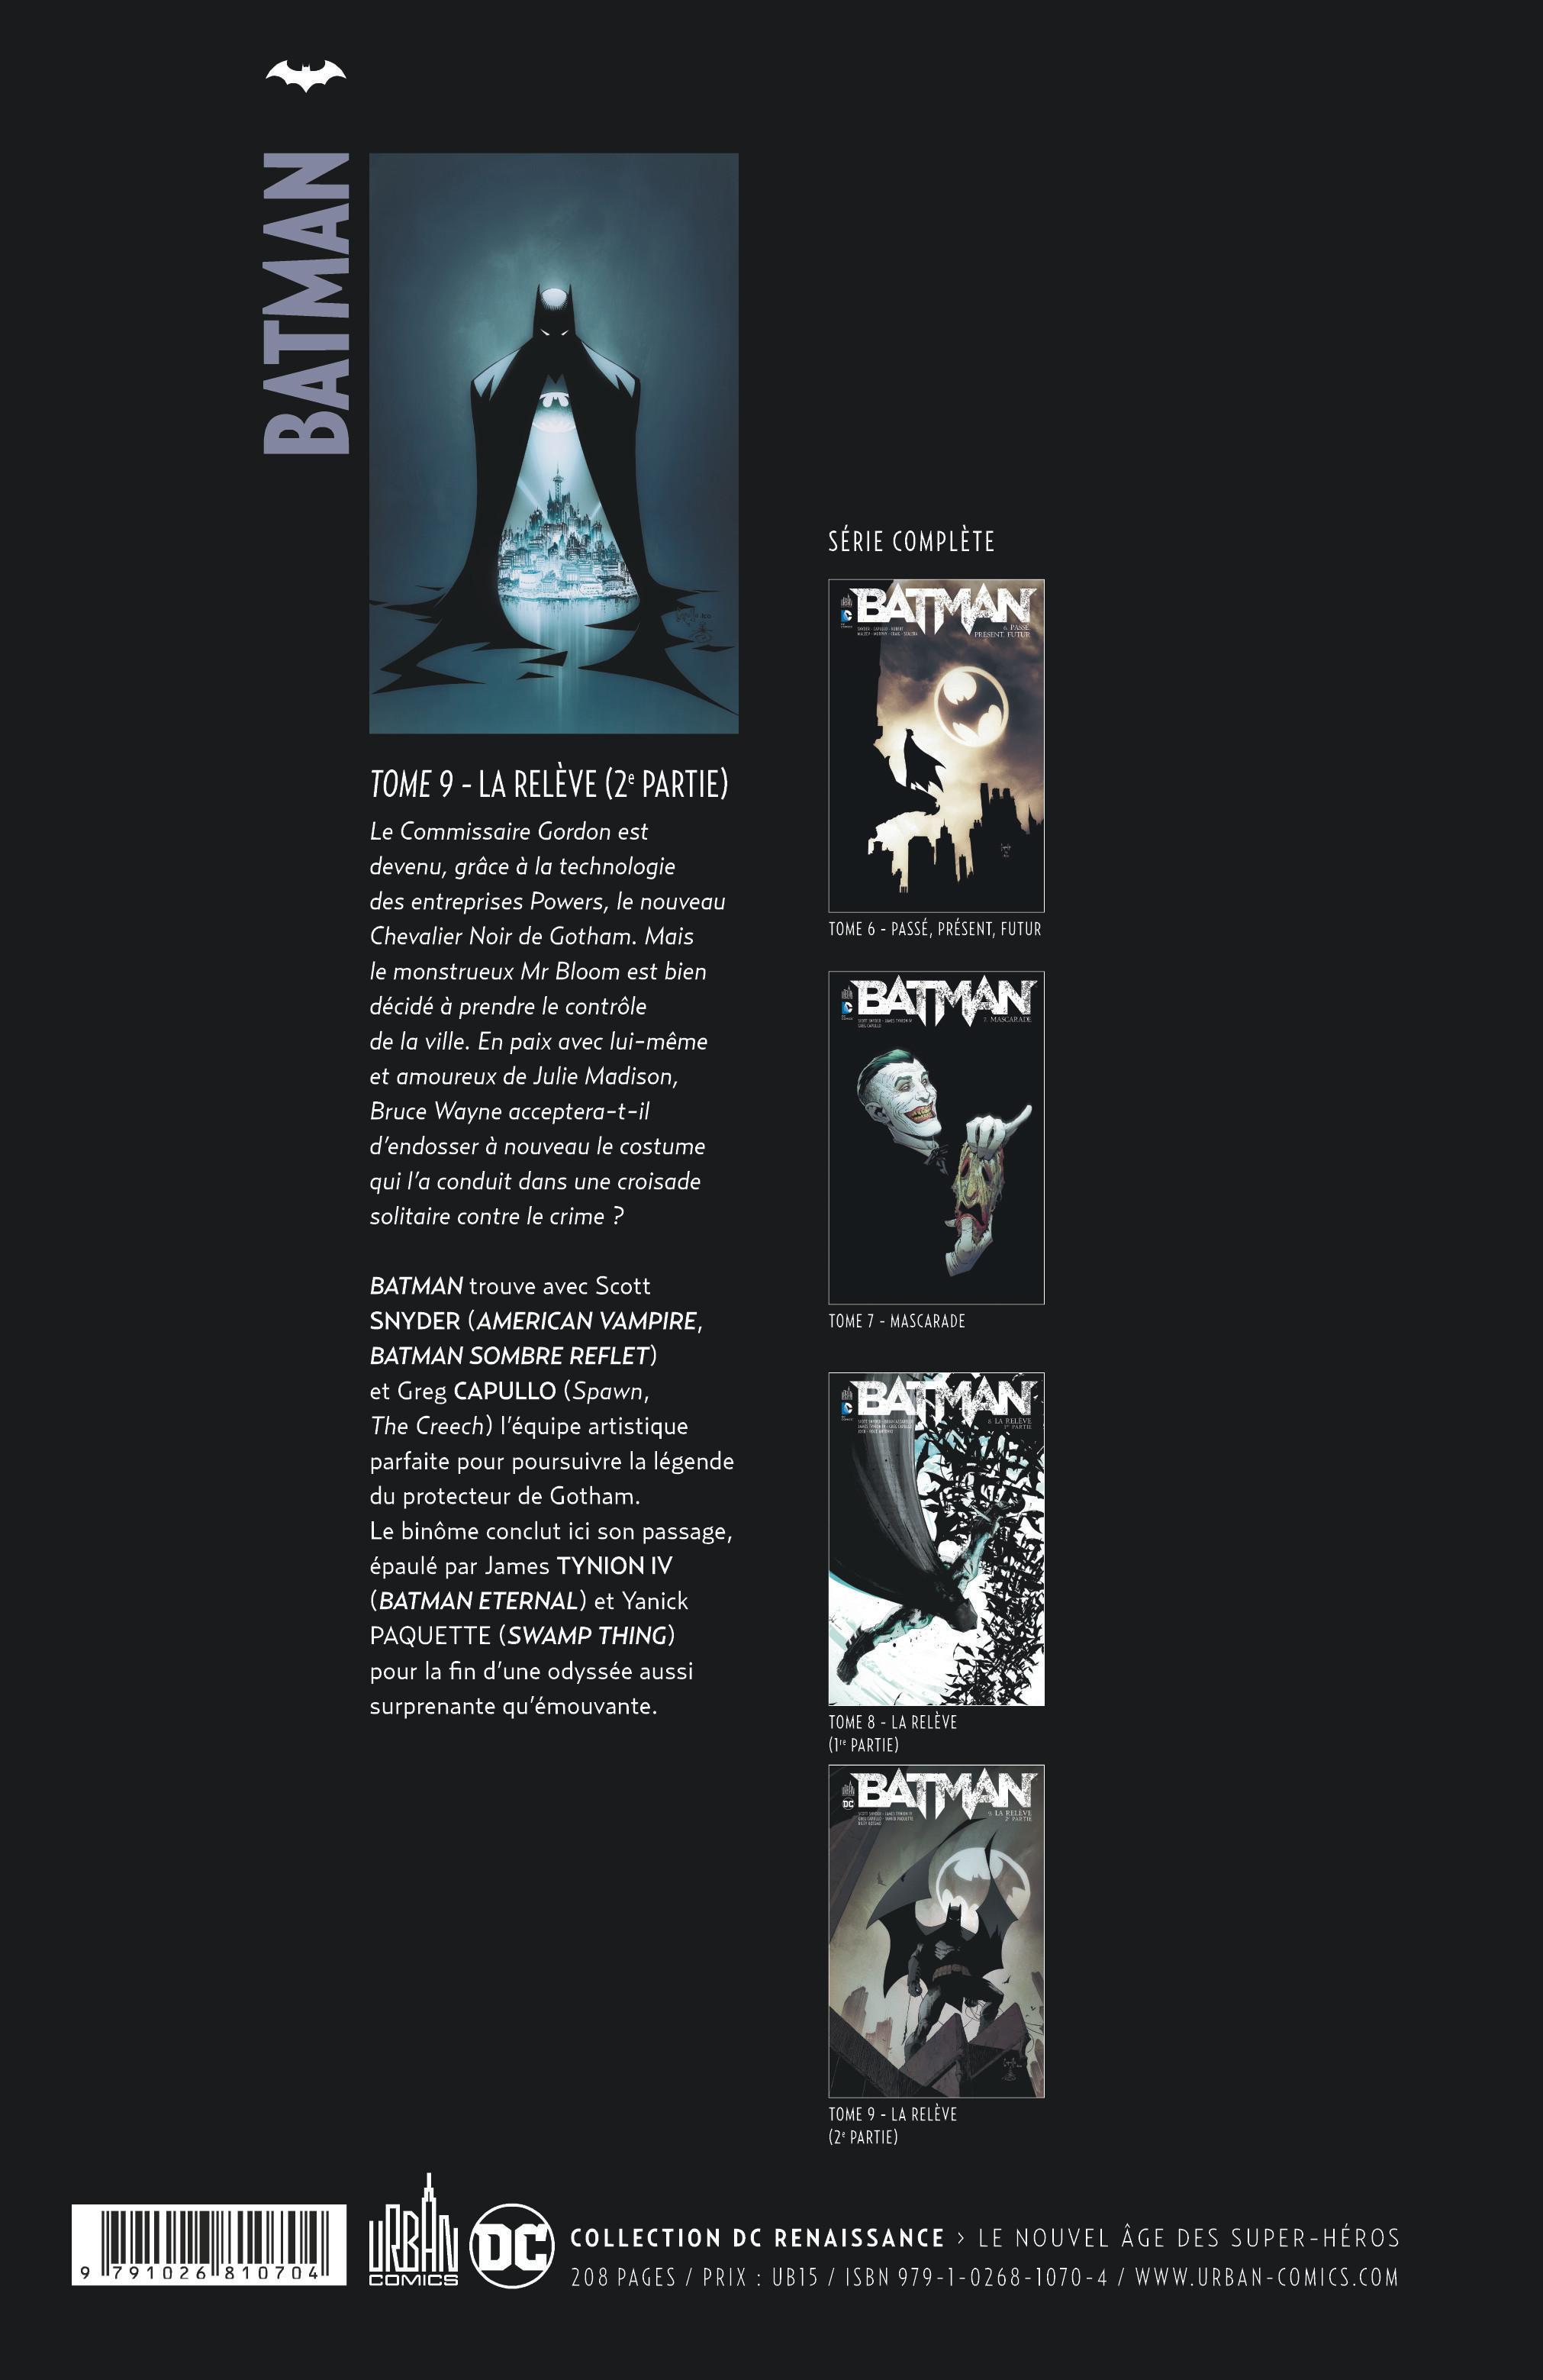 BATMAN TOME 9